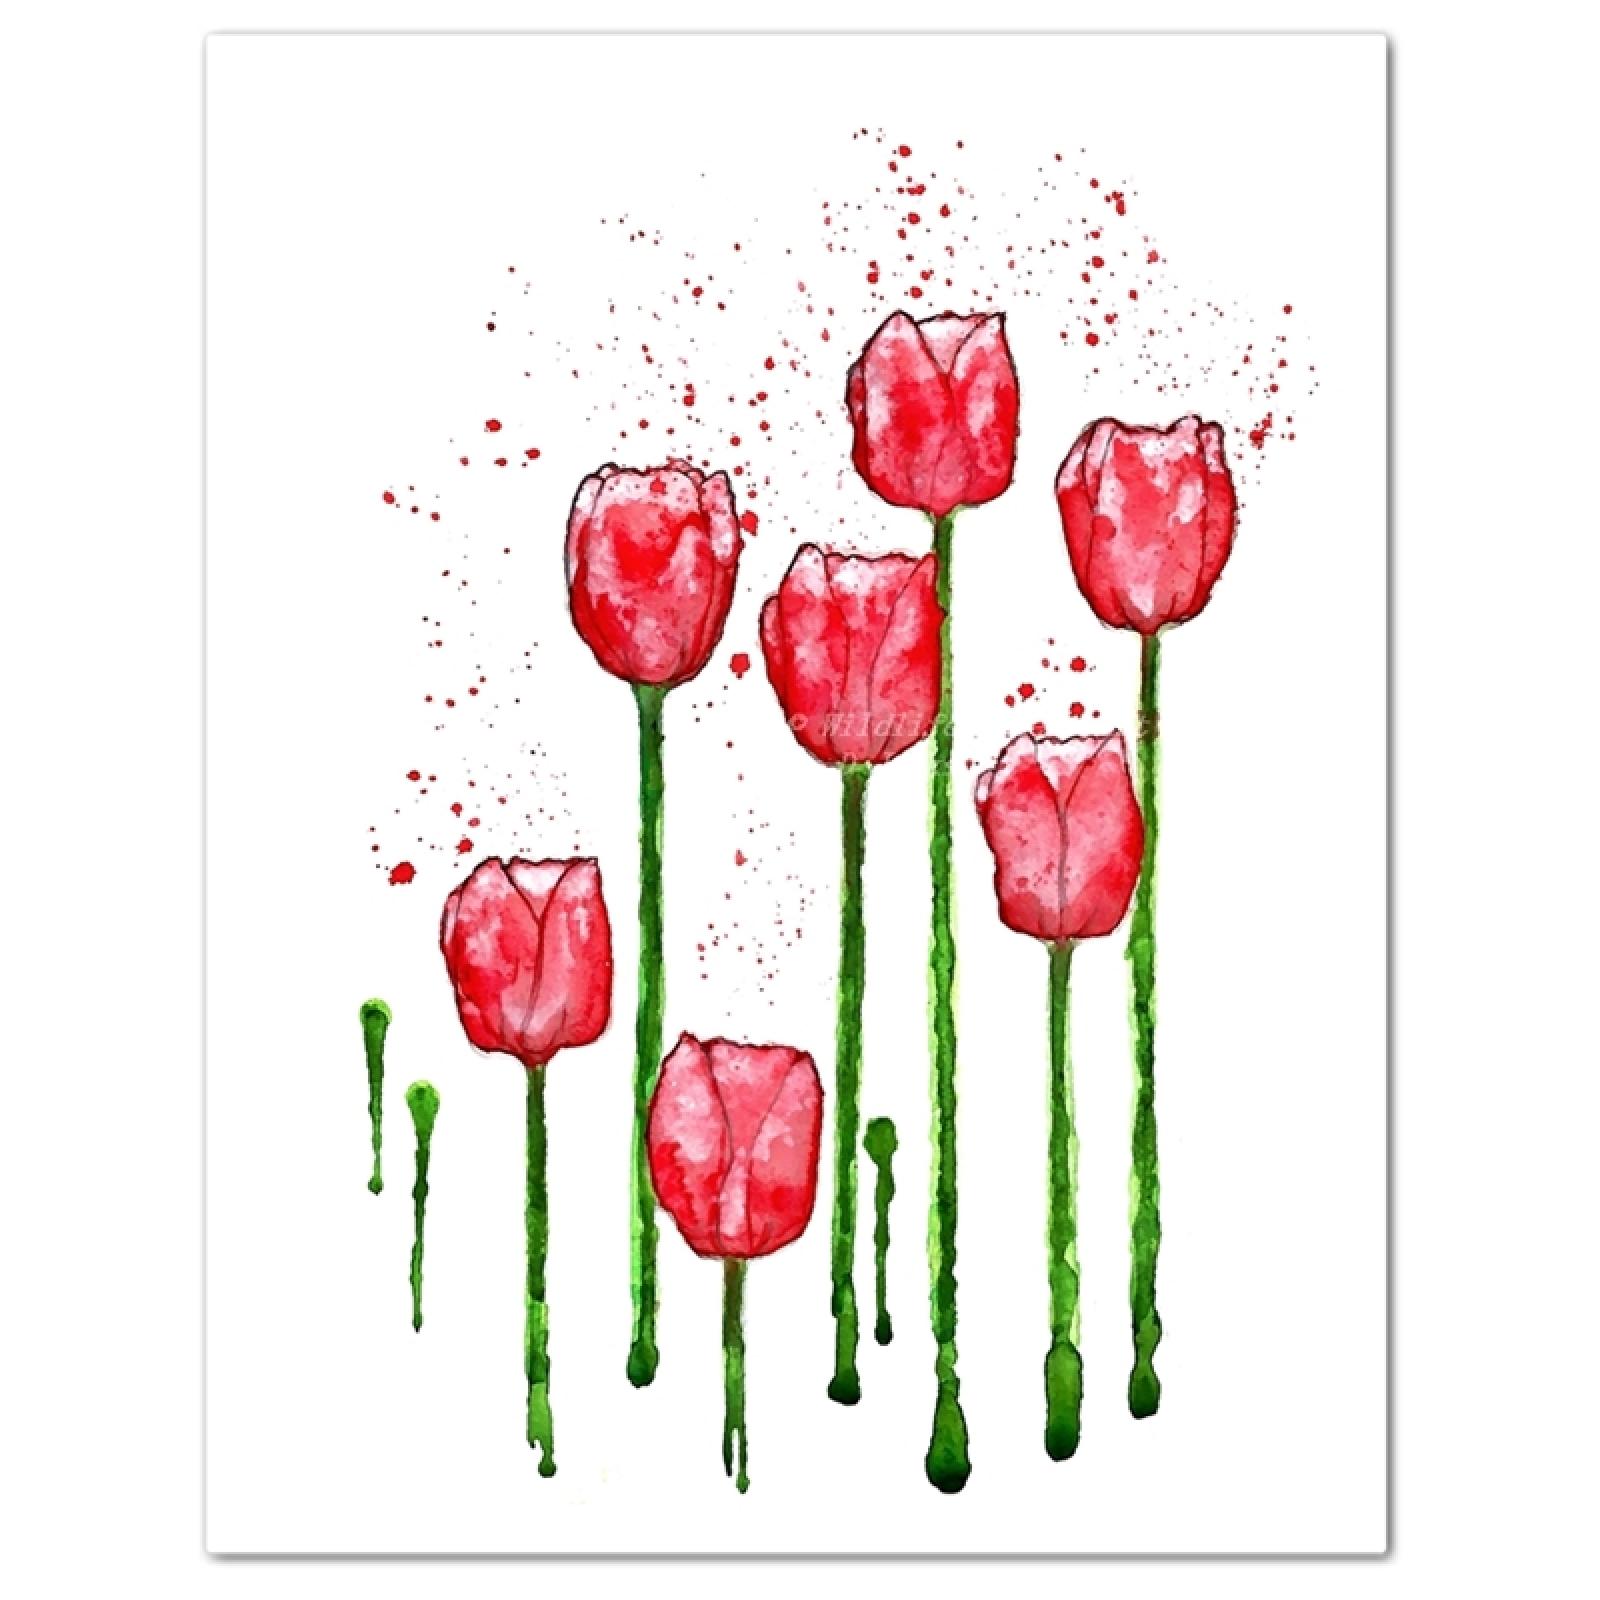 1600x1600 Red Tulips Minimalist Watercolor Art Print Wildlife Gardener Art